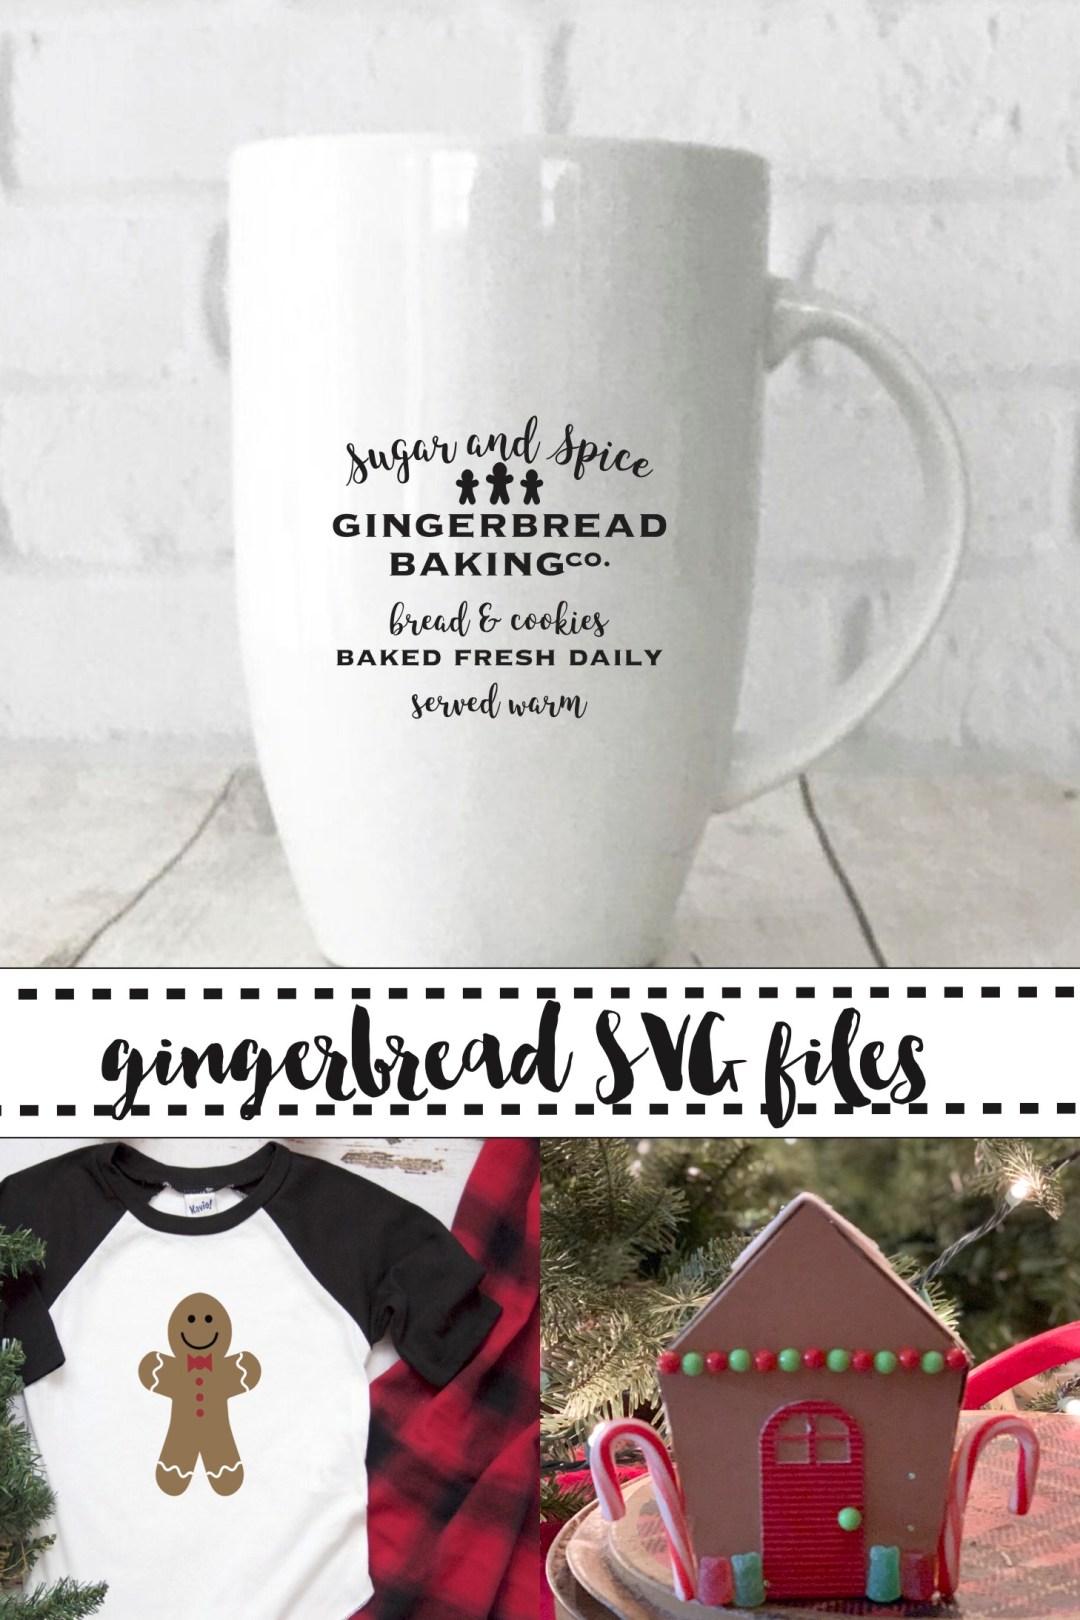 Gingerbread House Gingerbread Shirt Cocoa Mug